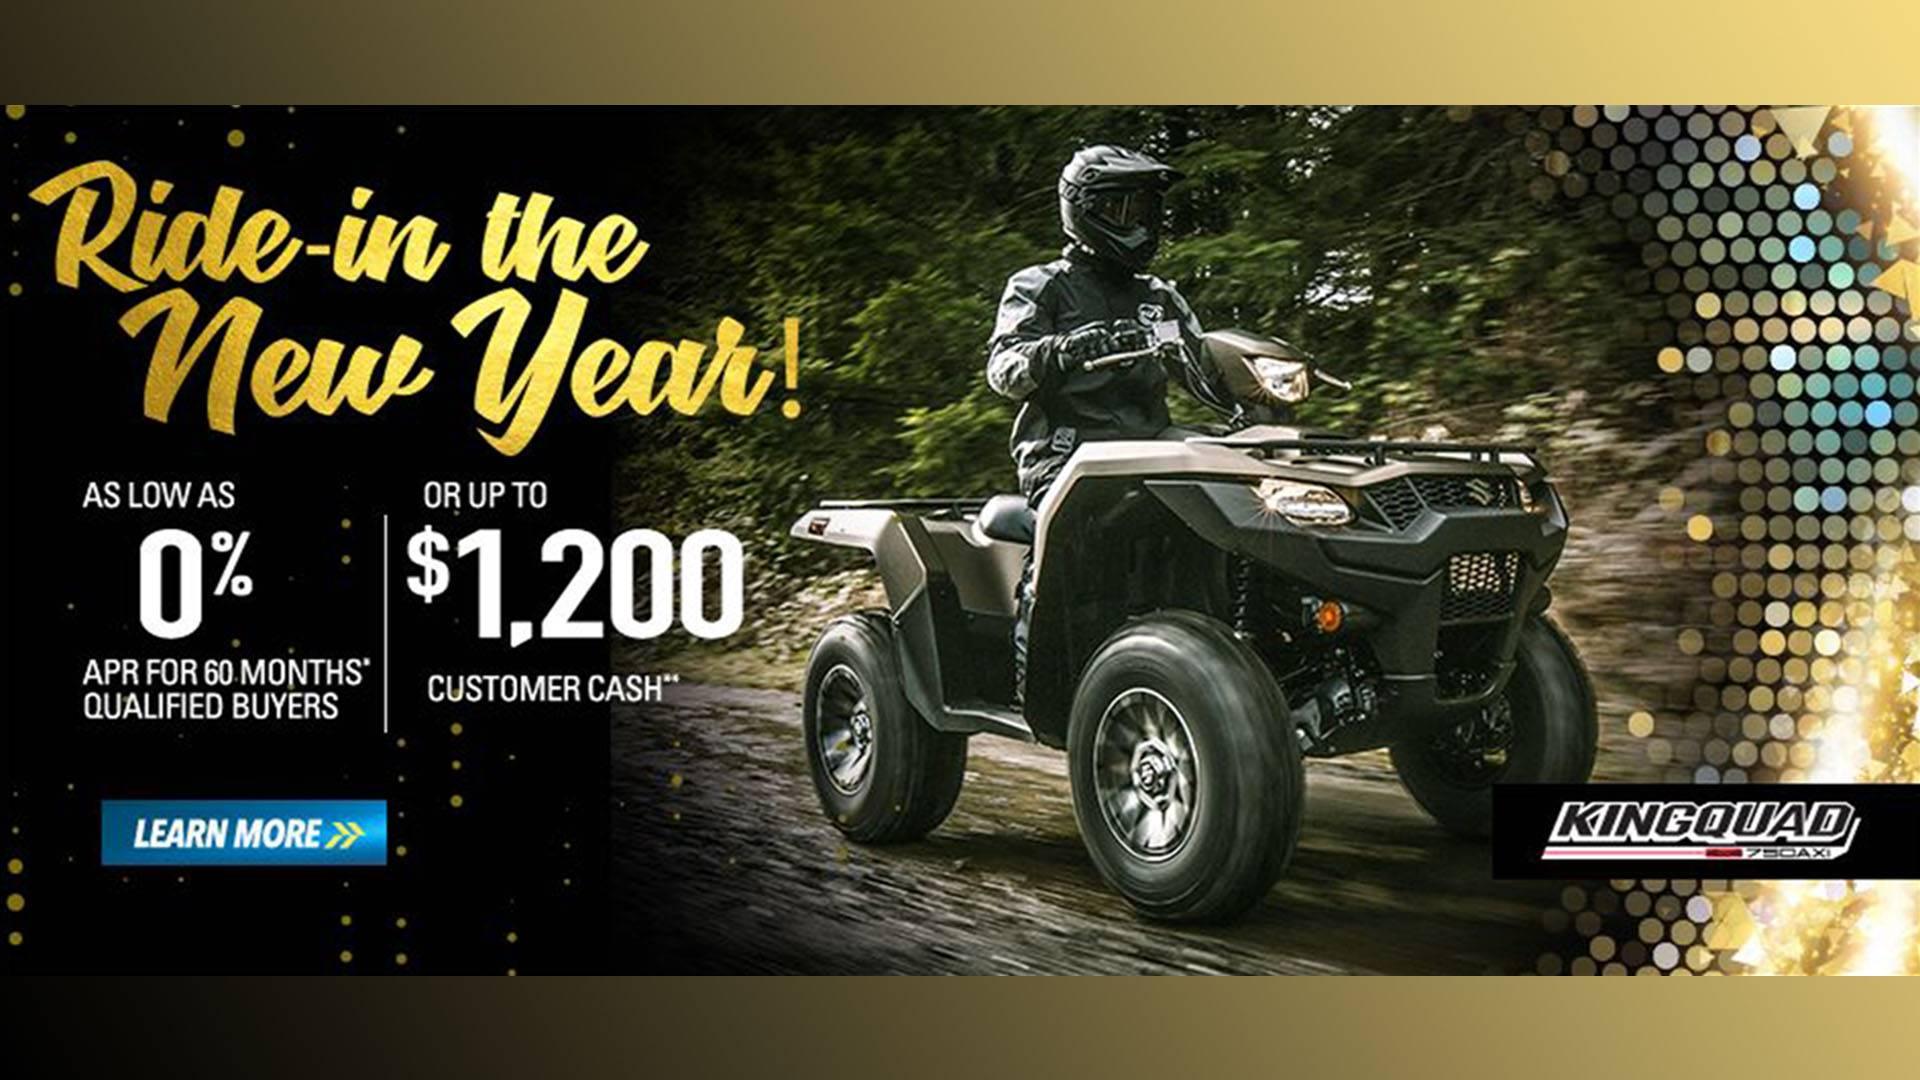 Suzuki - Ride in the New Year - All ATVs